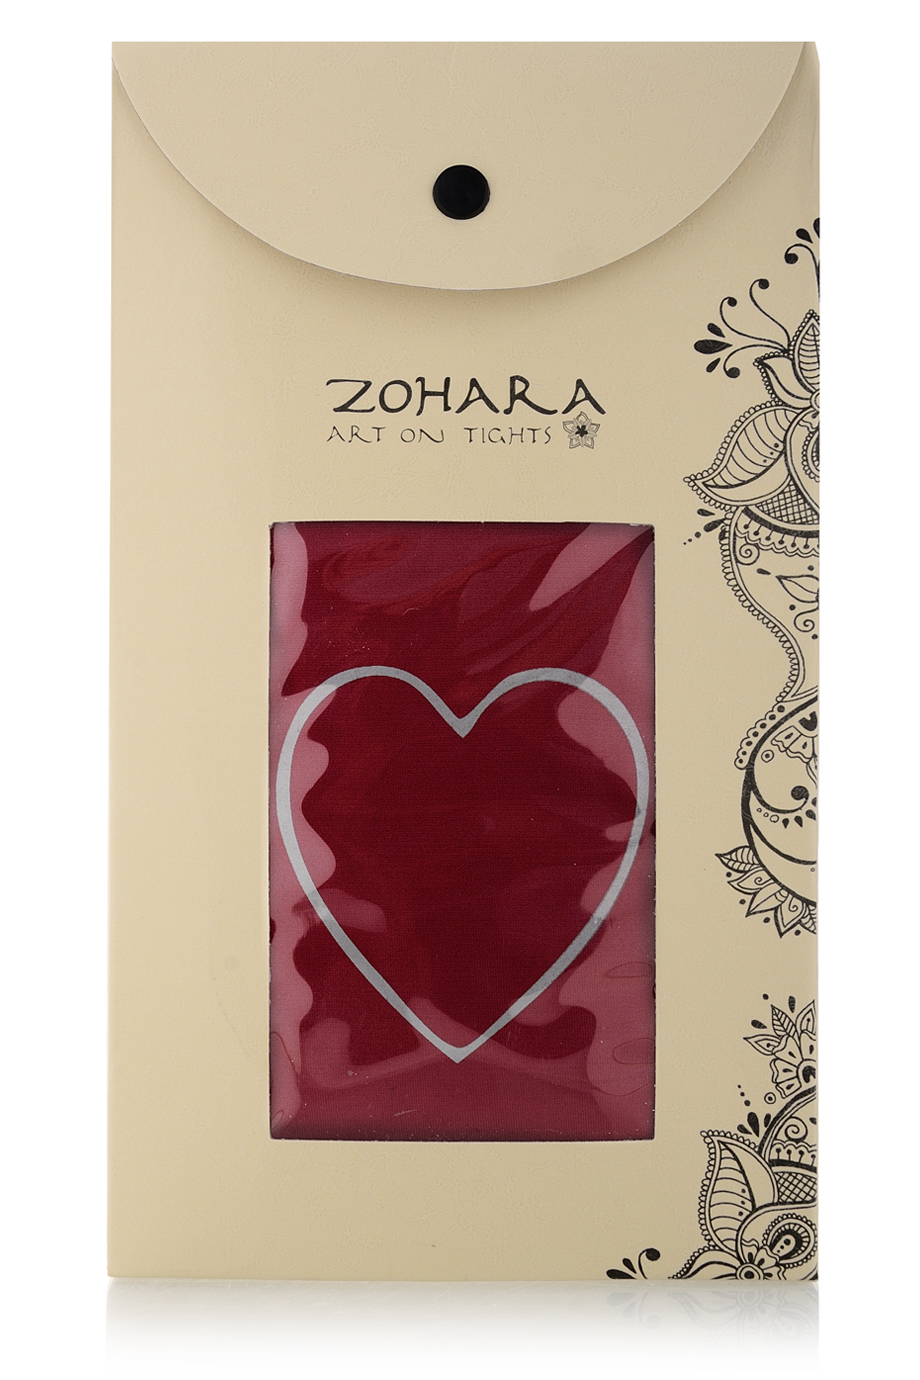 zohara-32